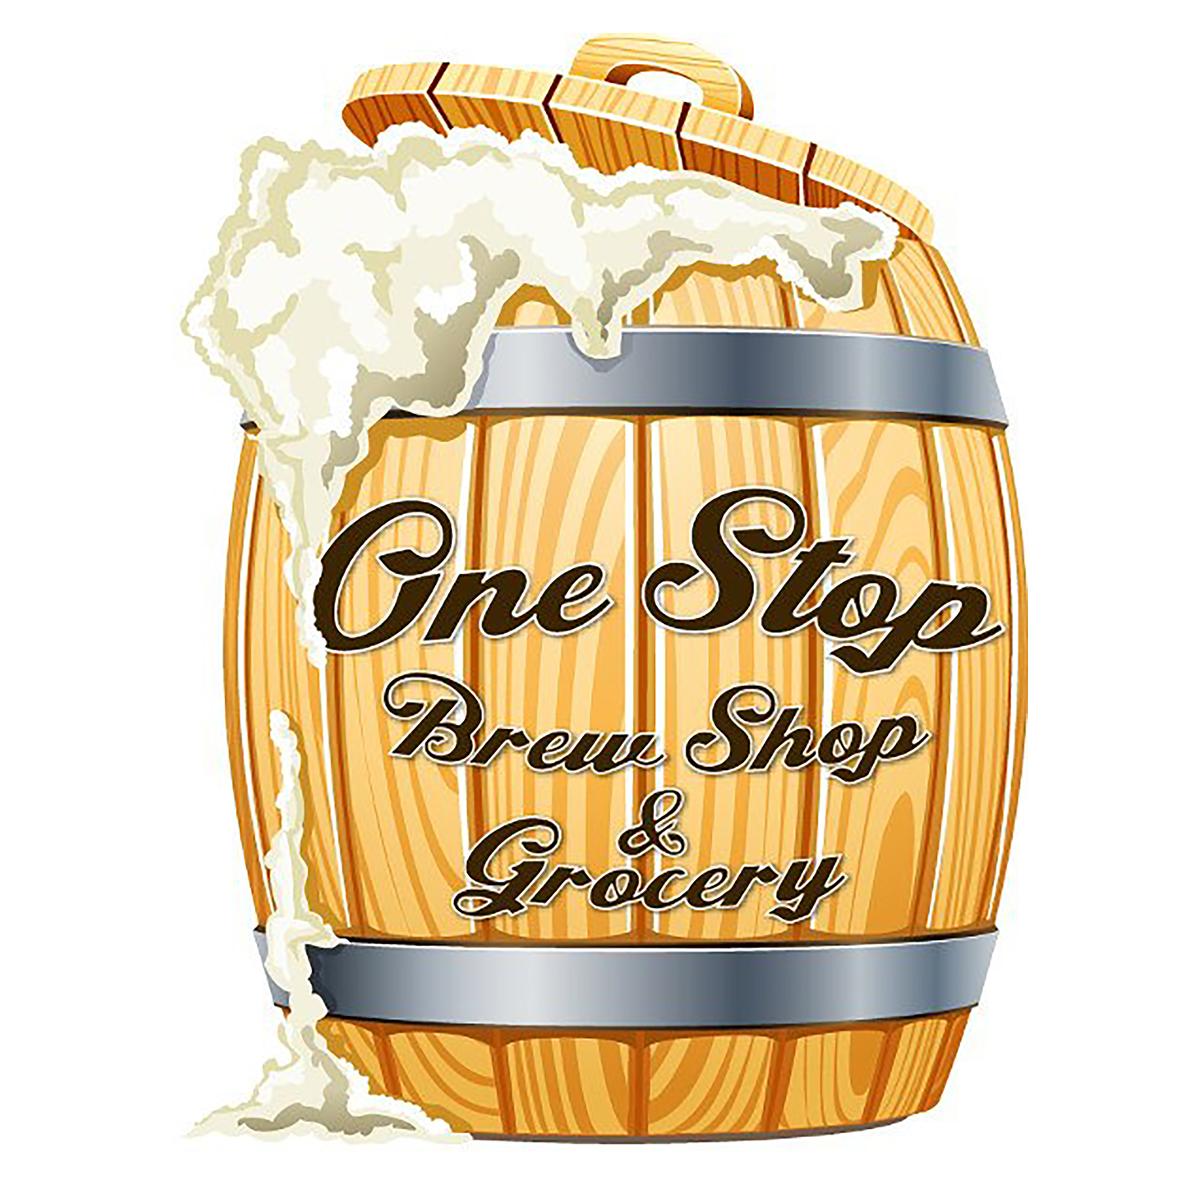 OneStopBrewShop_Logo.png